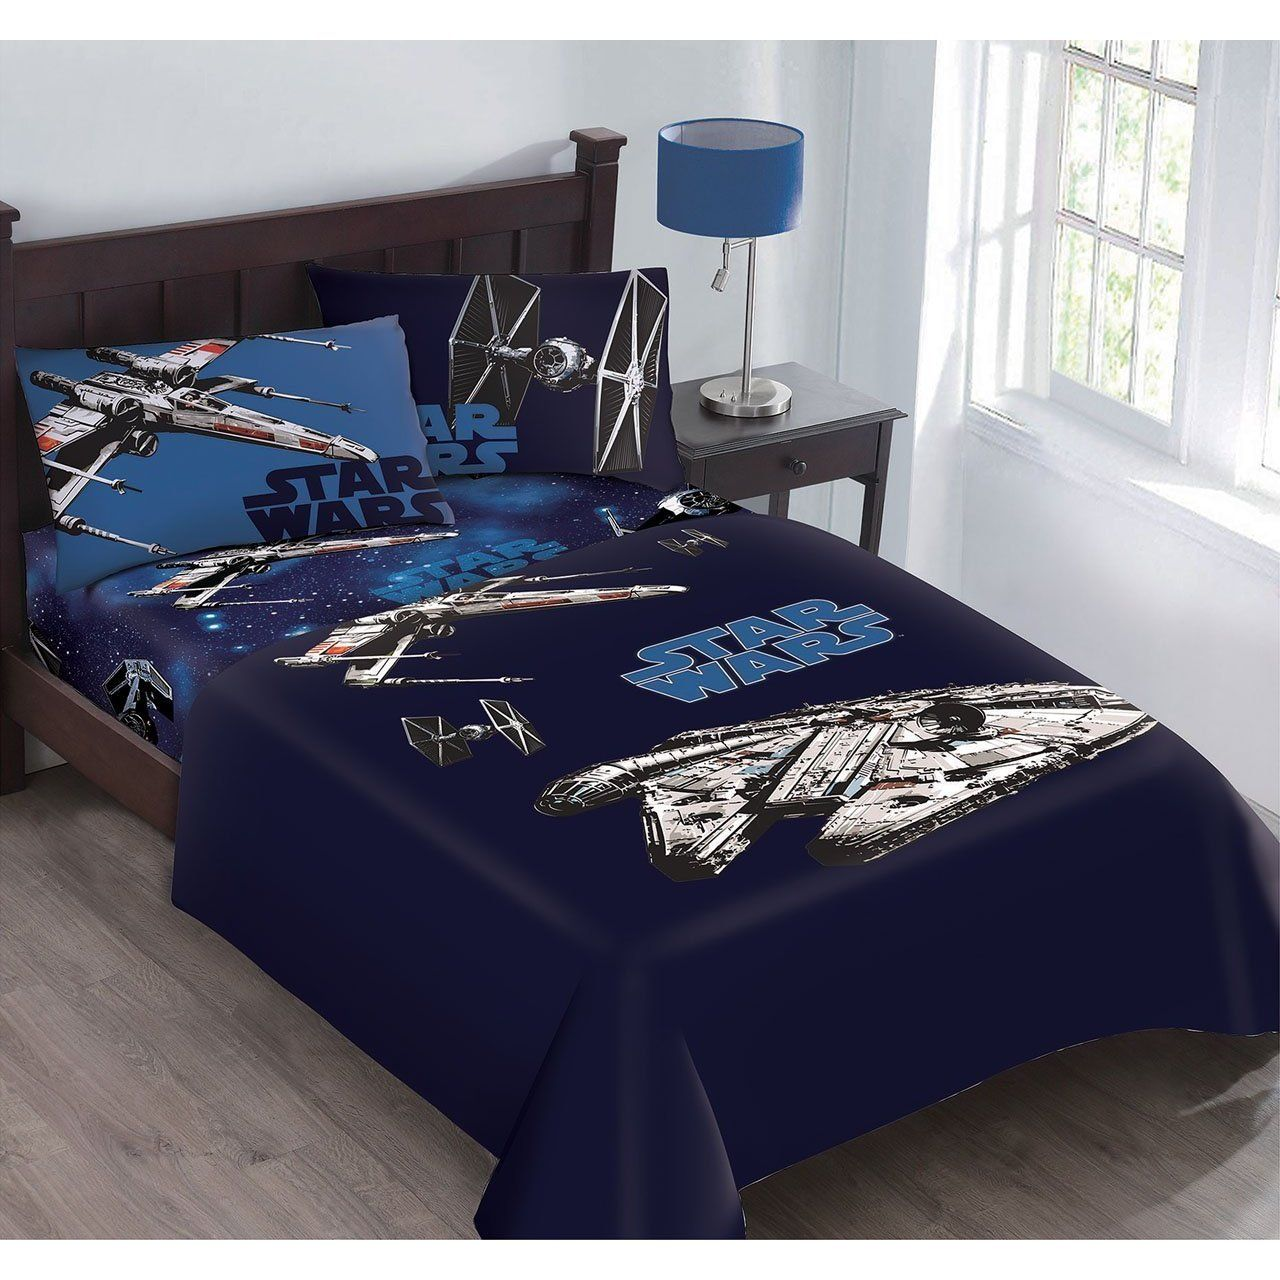 Disney Star Wars Comforter Products Twin Comforter Sets